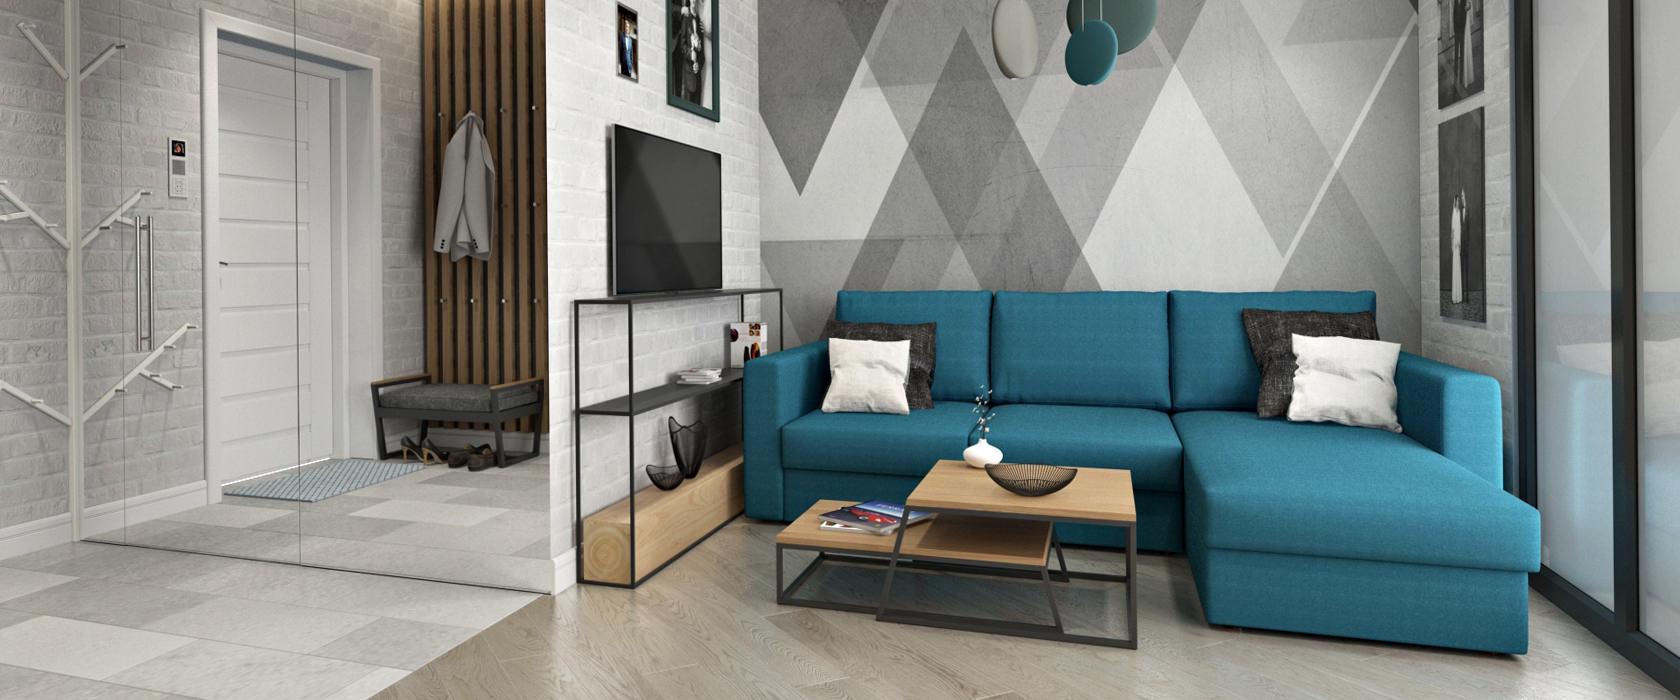 Кутовий диван Bianca - Фото 2 - Pufetto